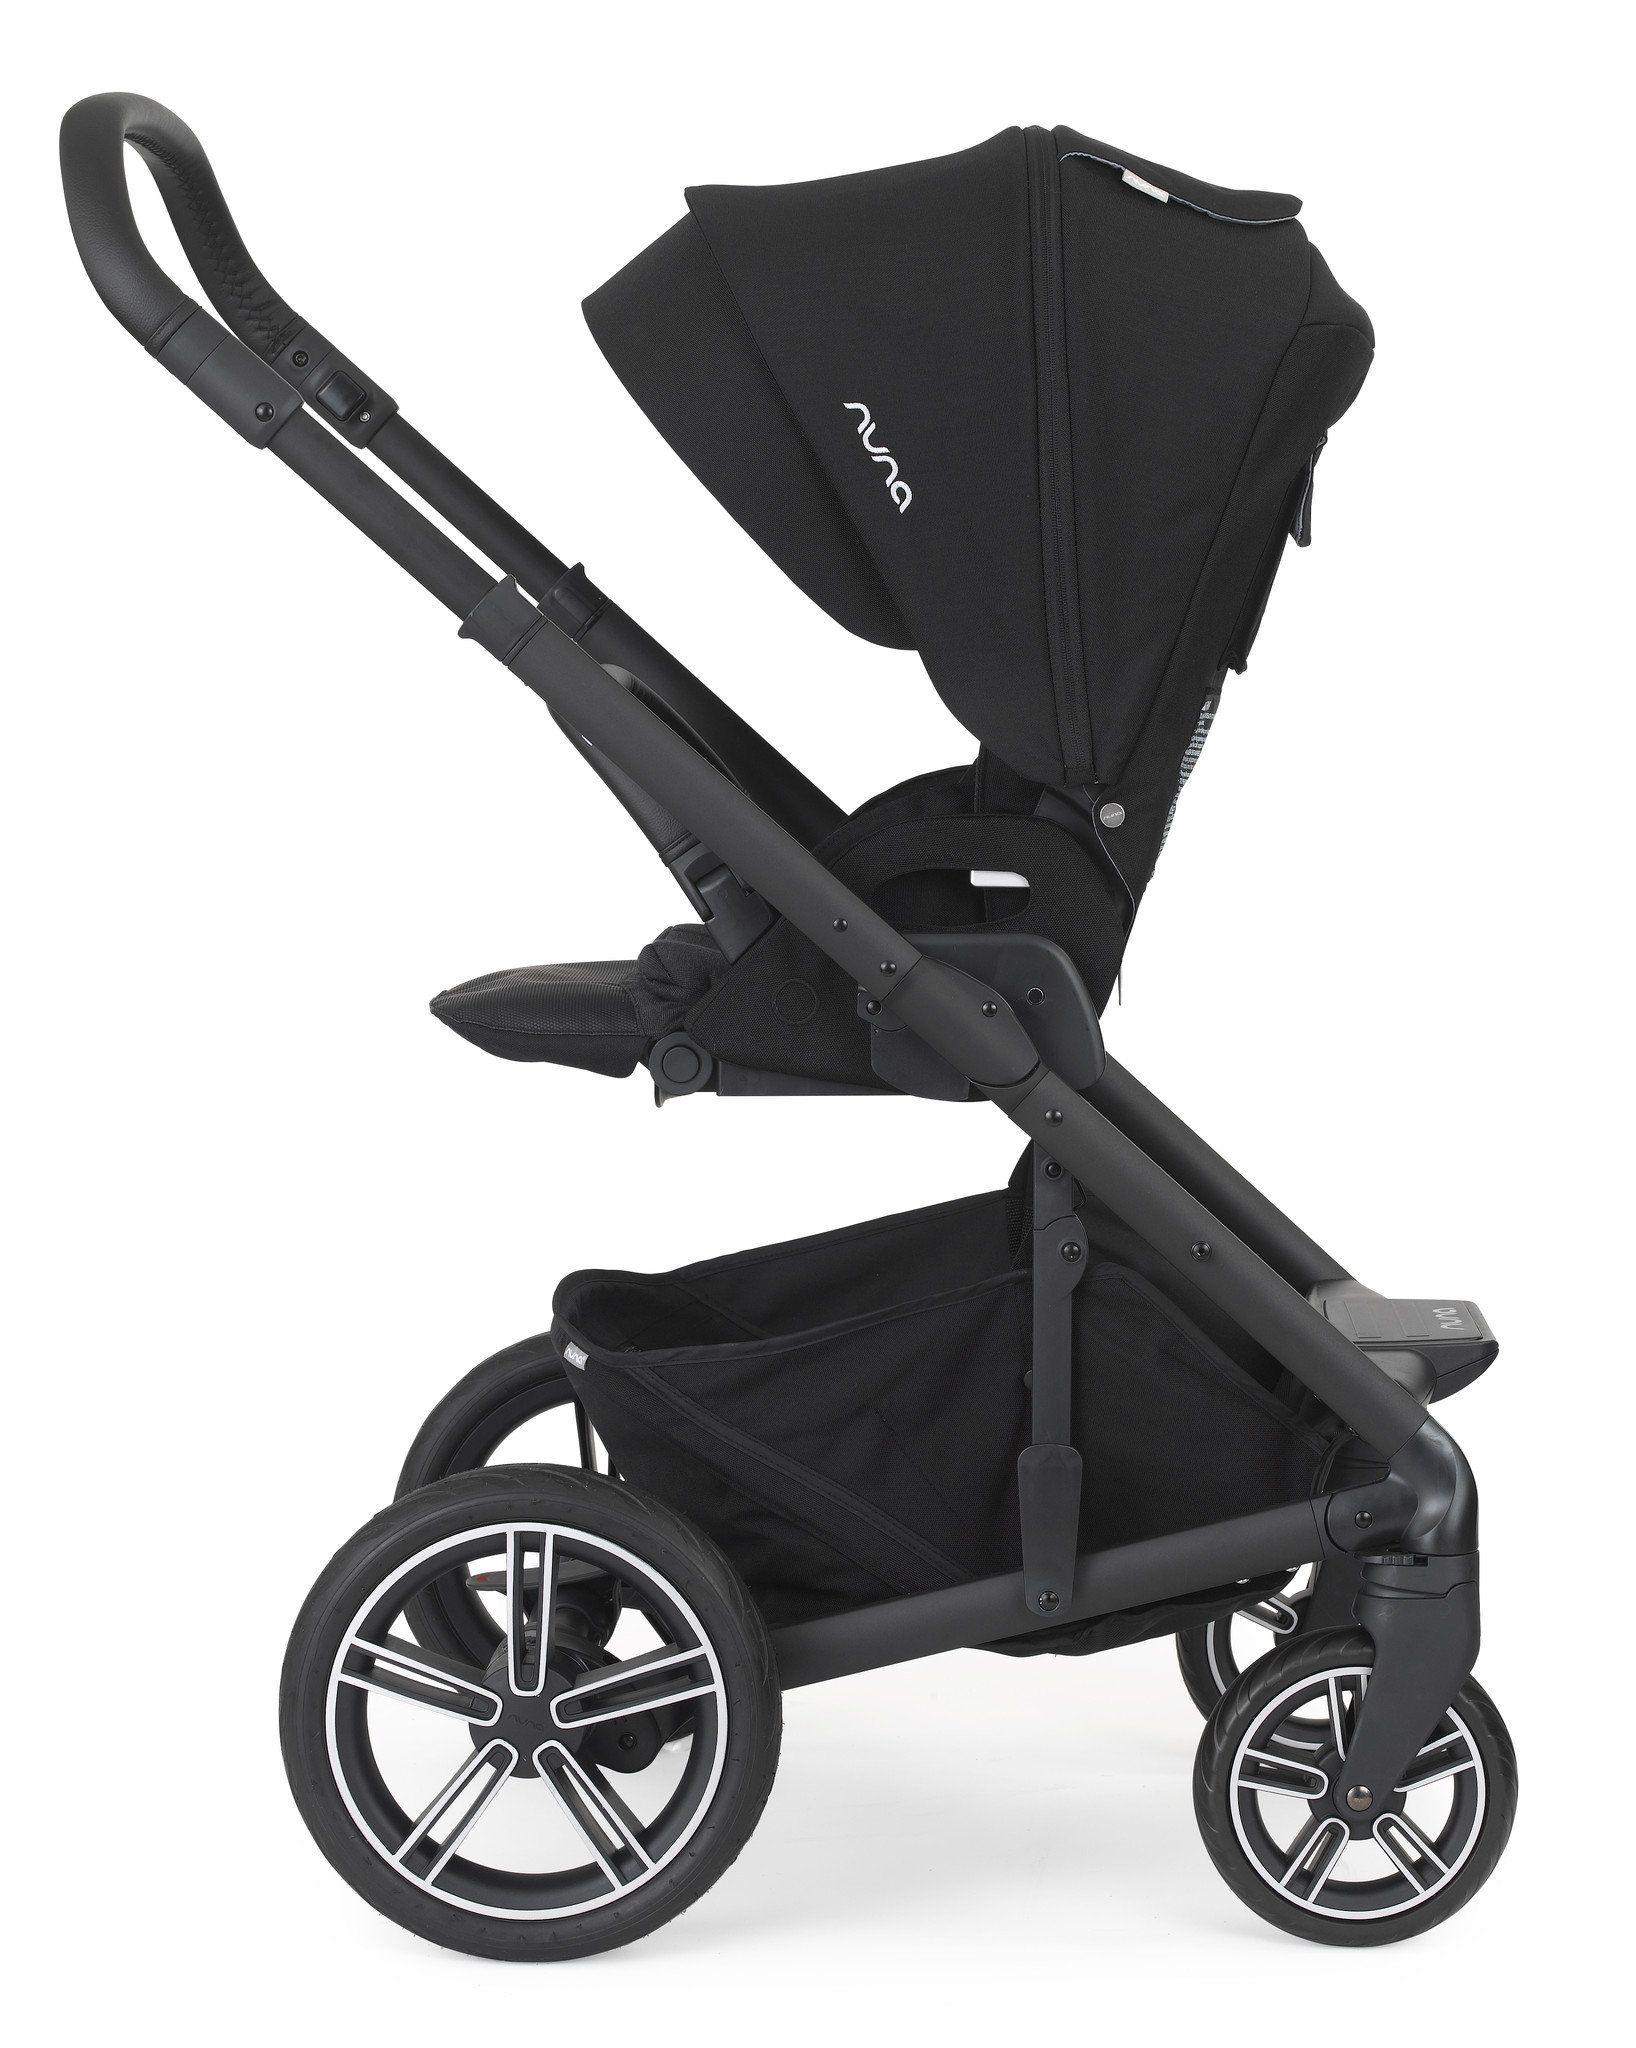 Nuna mixx 2 infant car seat compatible stroller stroller